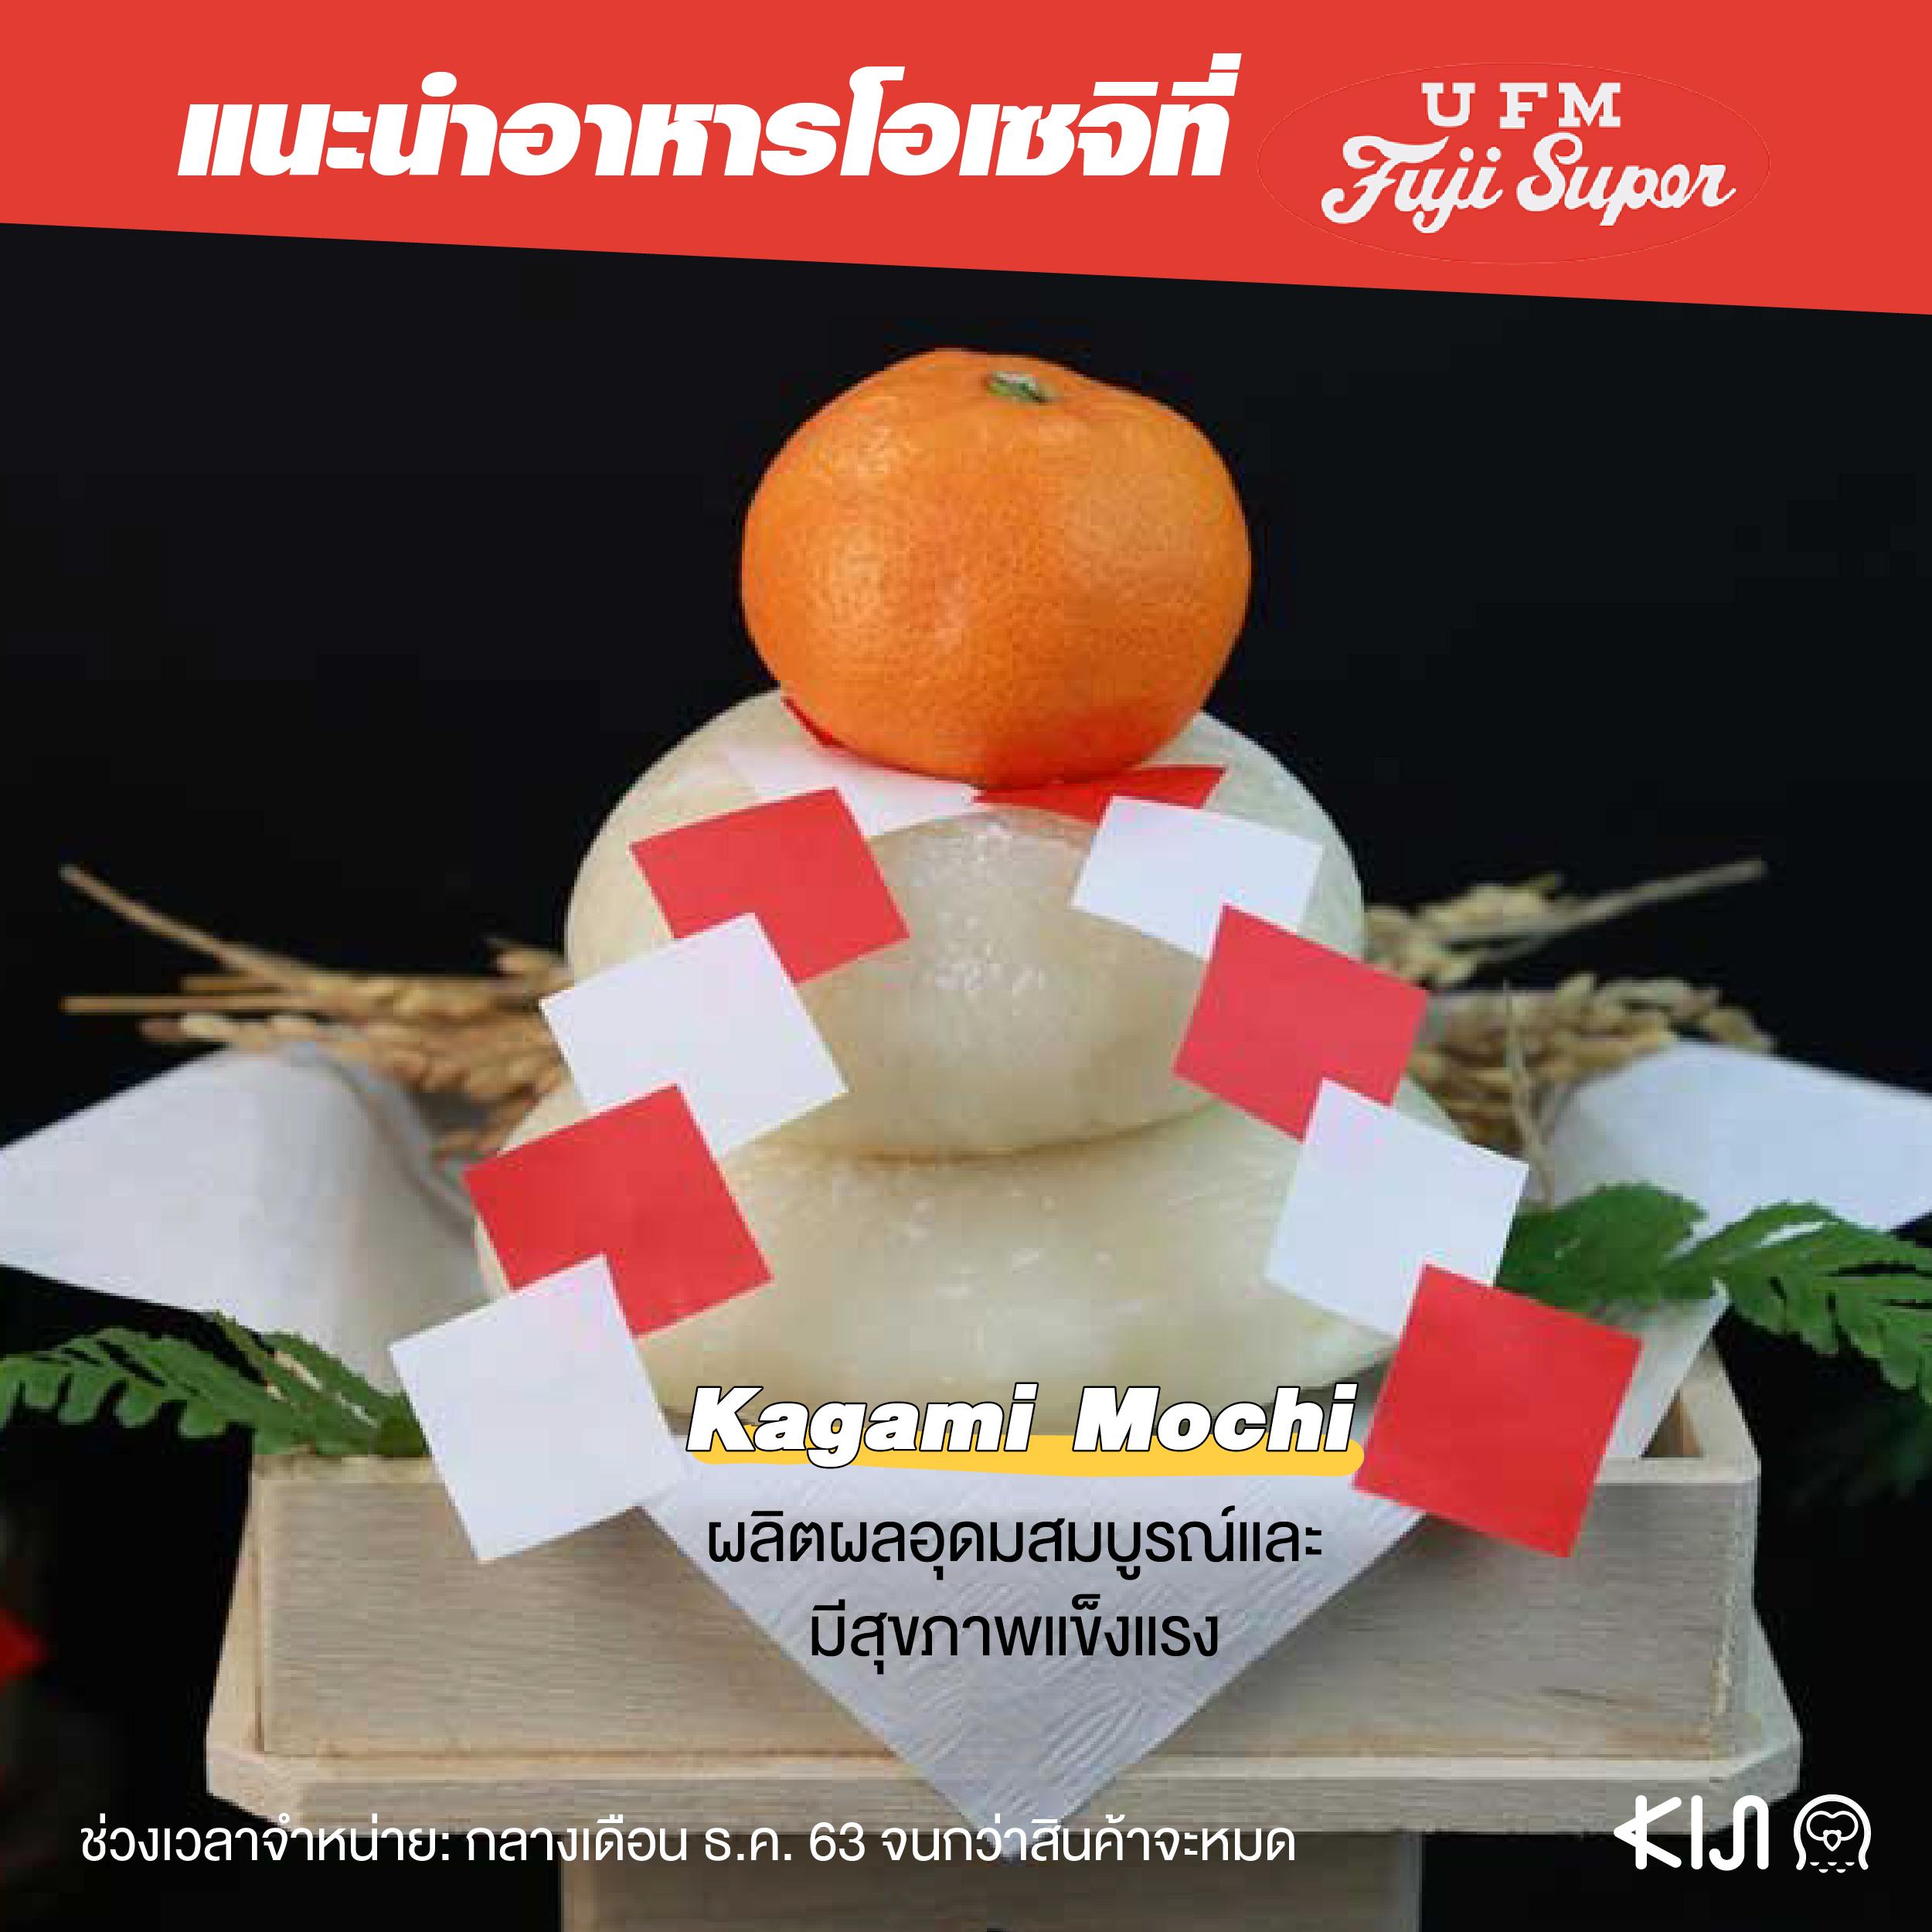 Kagami Mochi อาหารโอเซจิที่ UFM Fuji Super